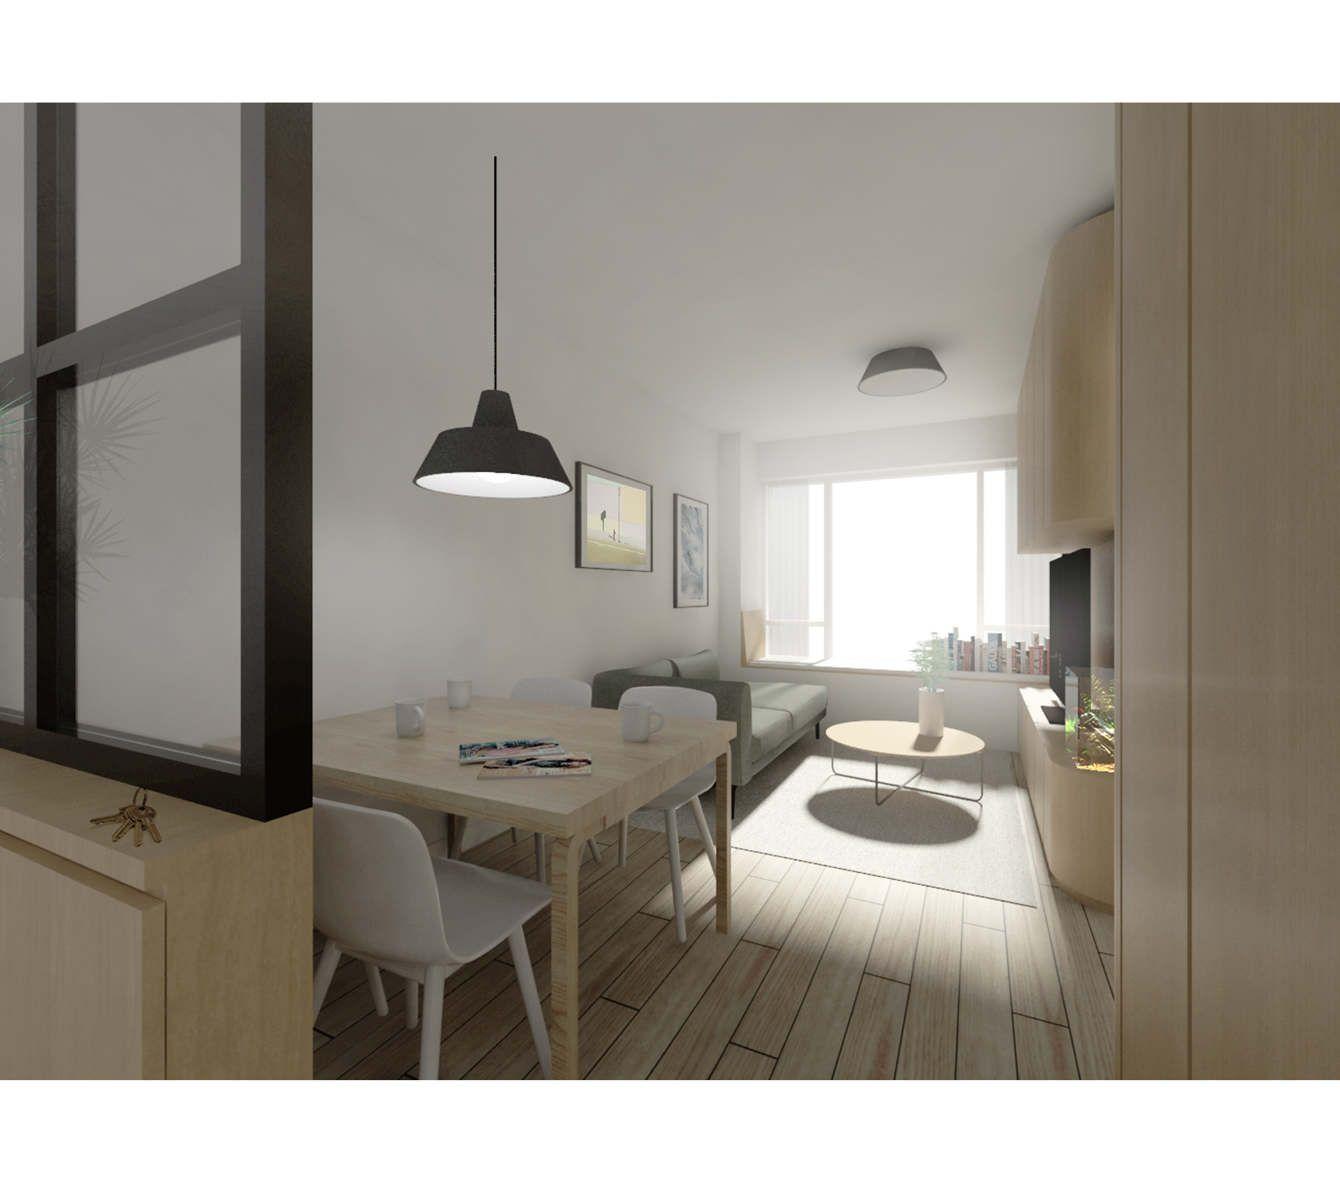 Interior 1 室內一 - Napp Studio